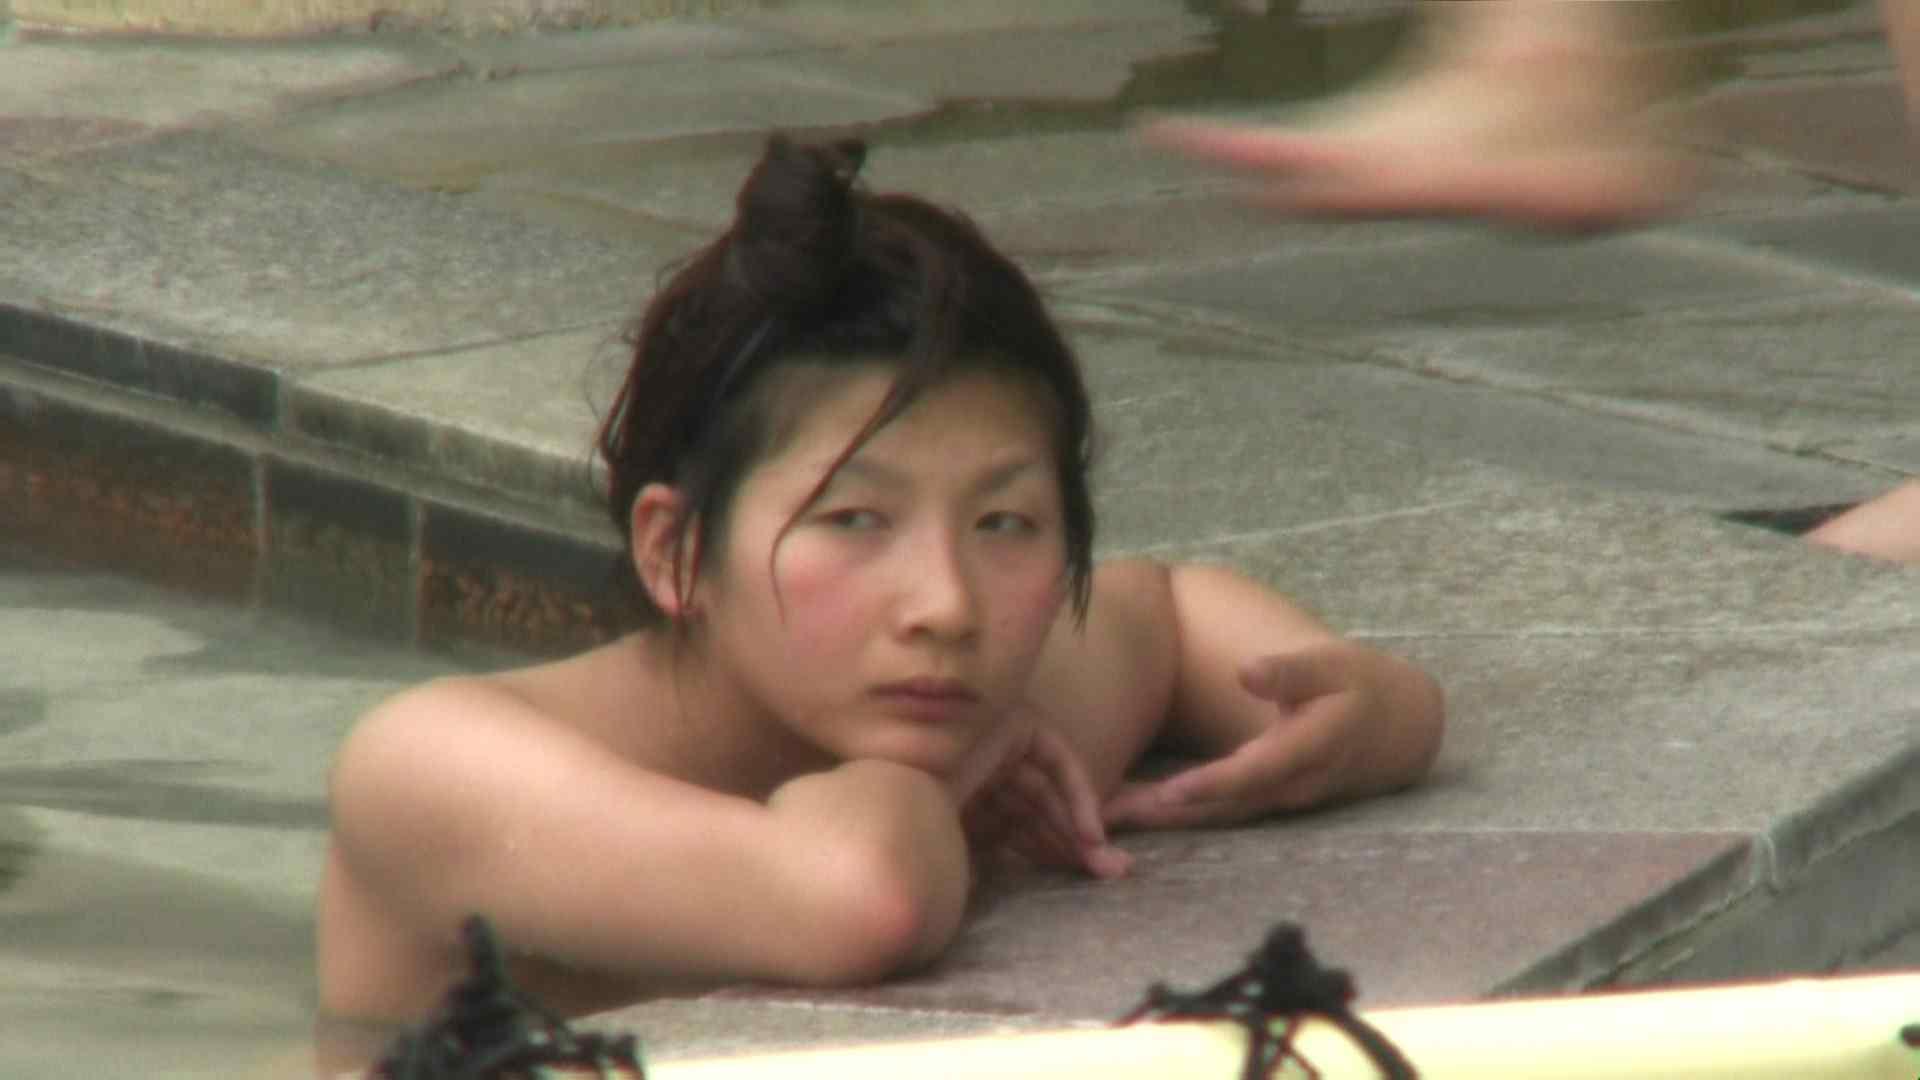 Aquaな露天風呂Vol.66【VIP限定】 盗撮師作品   露天風呂突入  83pic 22